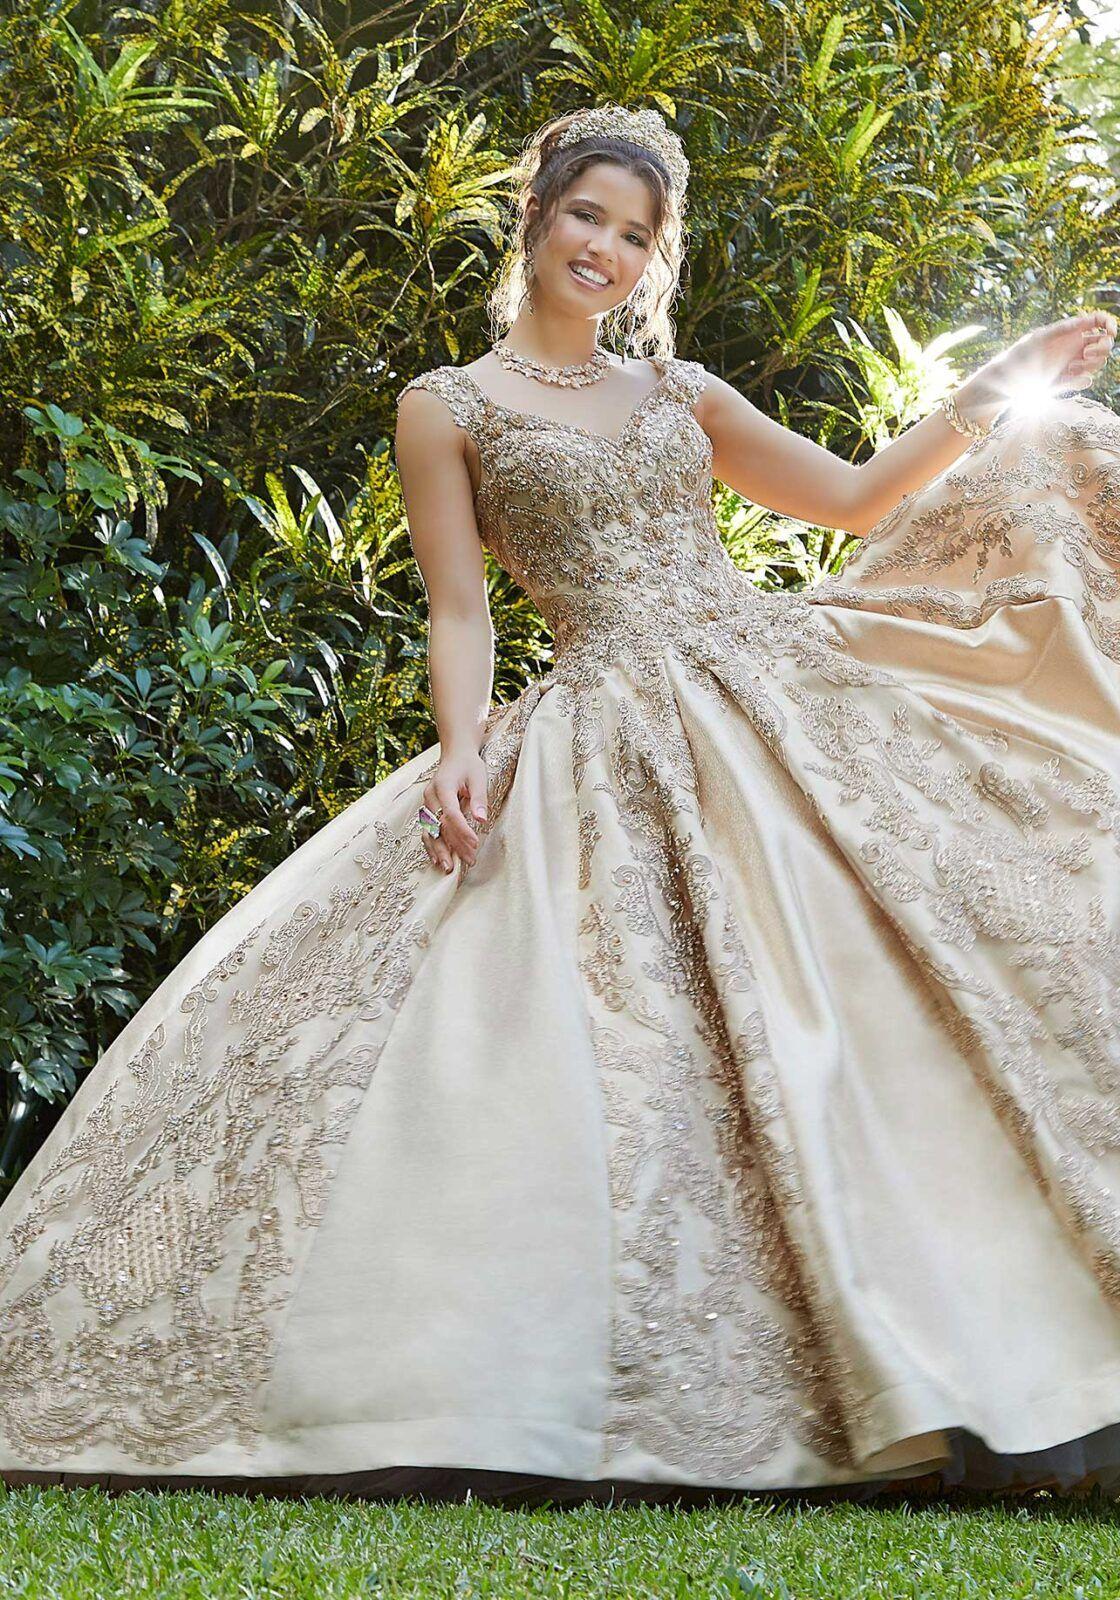 Metallic Lace And Larissa Satin Quinceanera Dress Morilee Quinceanera Dresses Pink Quinceanera Dresses Dresses [ 1600 x 1120 Pixel ]